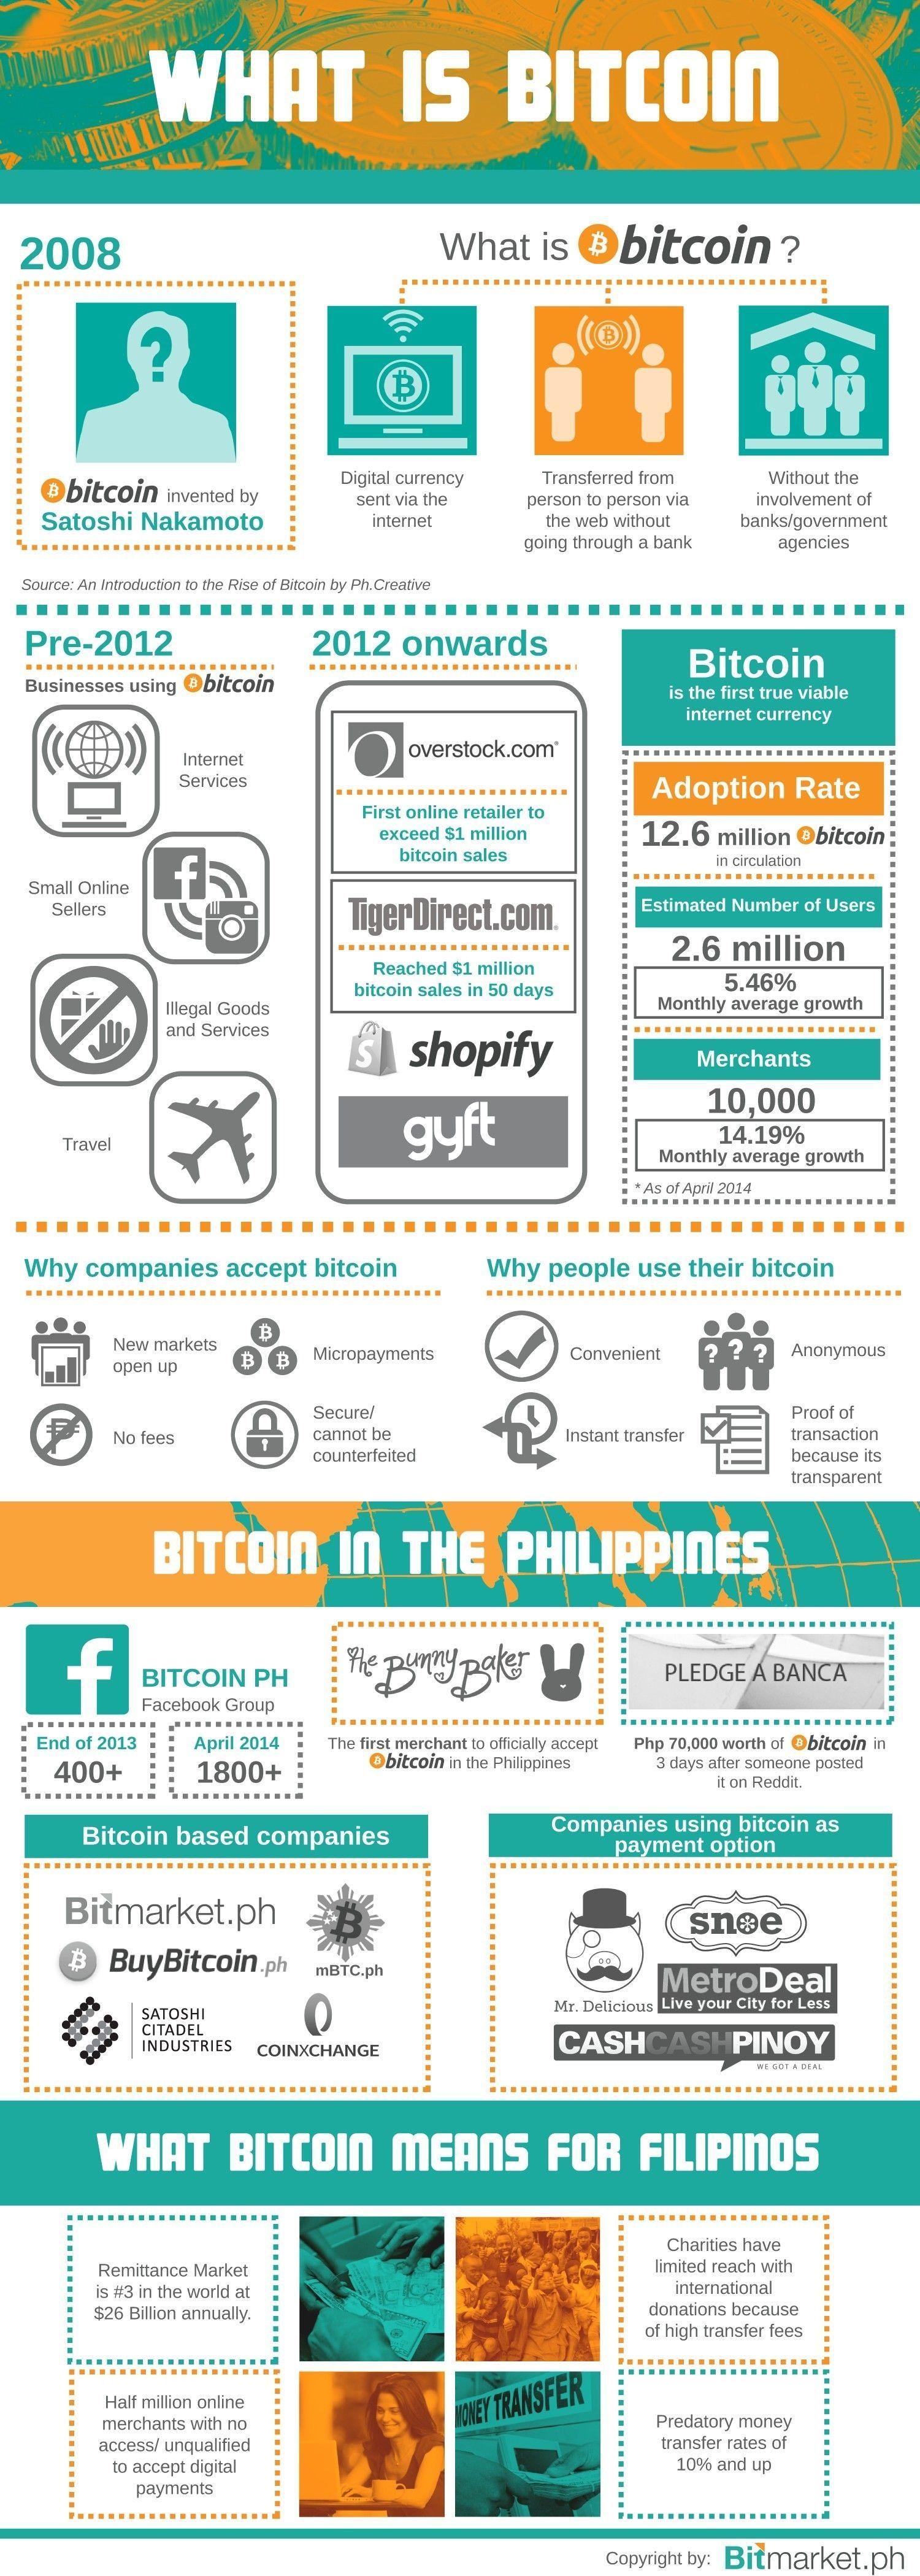 Video Explaining How To Buy Bitcoin Using Many Payment Methods Bitcoin Buybitcoin Cryptocurrency It S V Cryptocurrency What Is Bitcoin Mining Bitcoin Mining